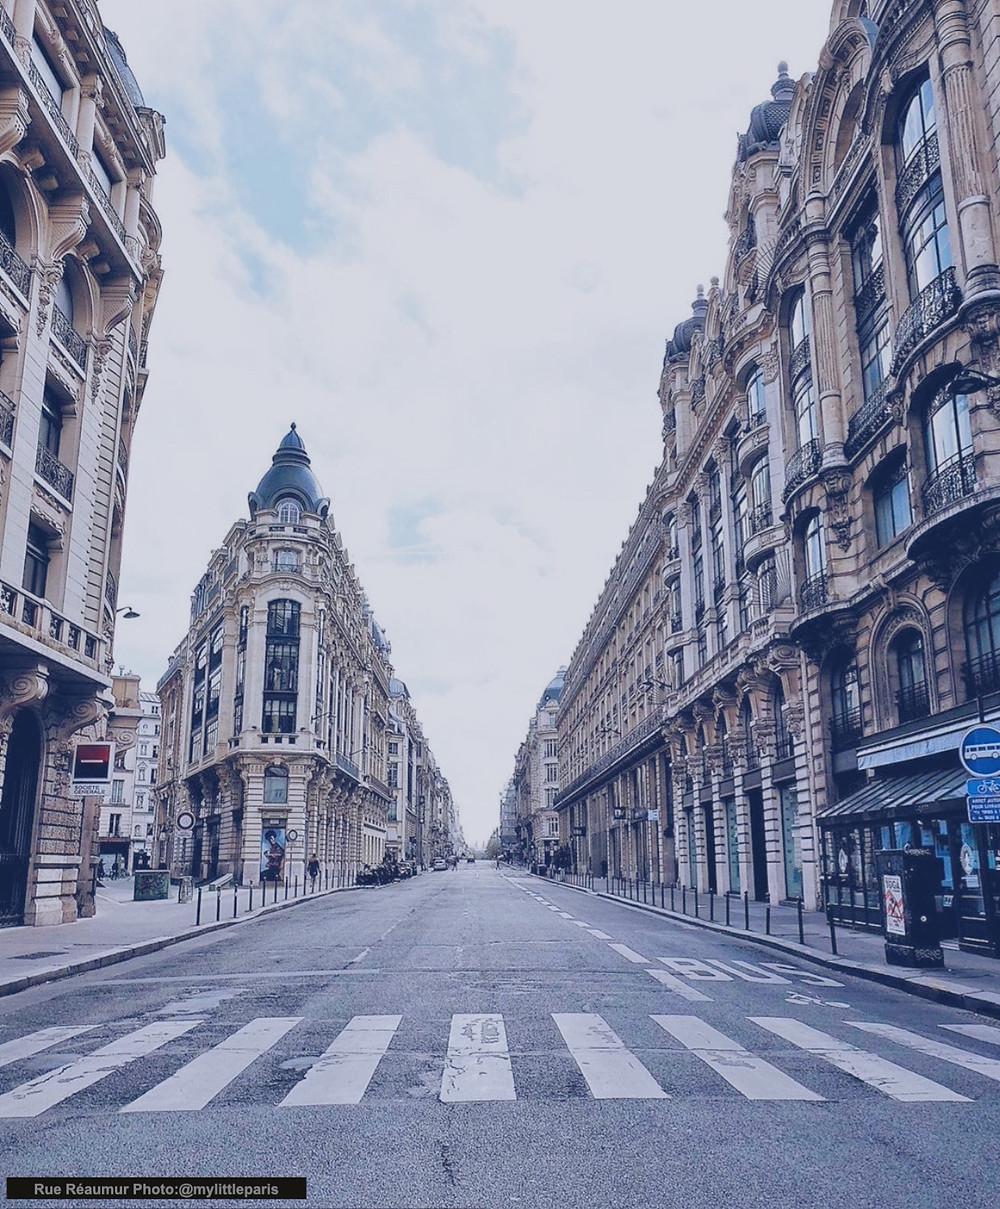 Rue Réamur  📸: @mylittleparis